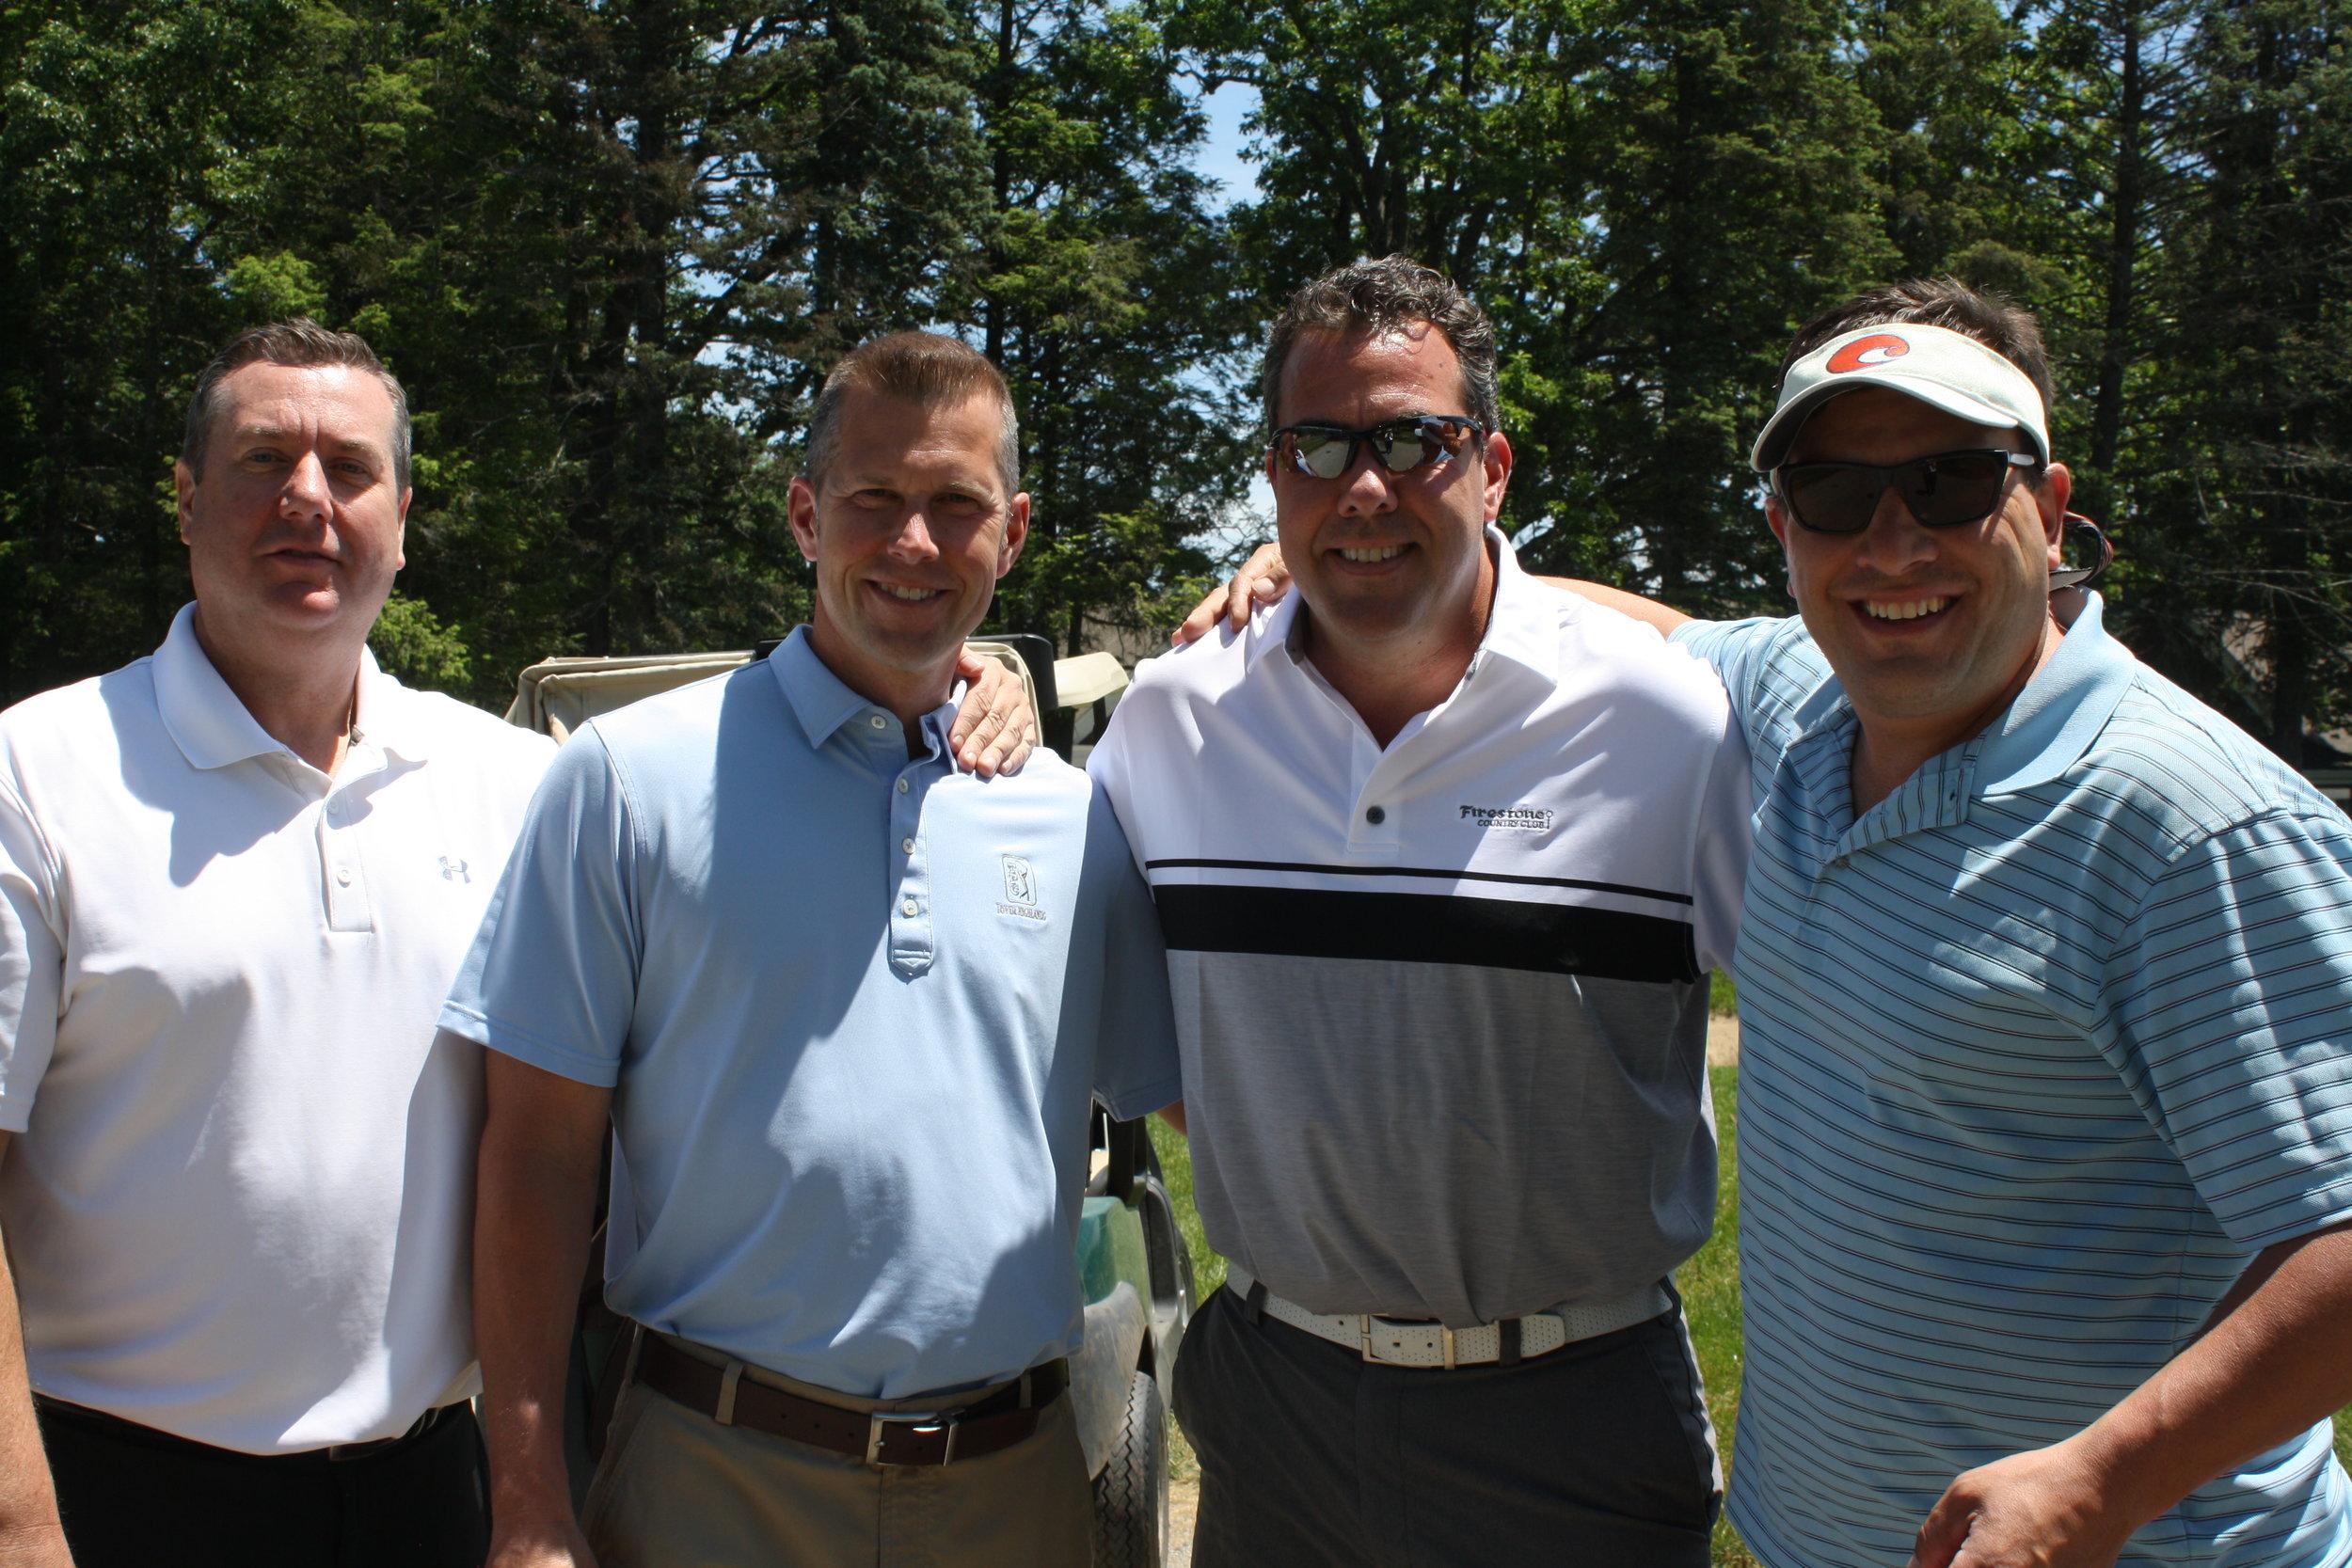 10 Jim Gillen, Matt Briand, Mike Pierson, Ryan LaGuardia.JPG